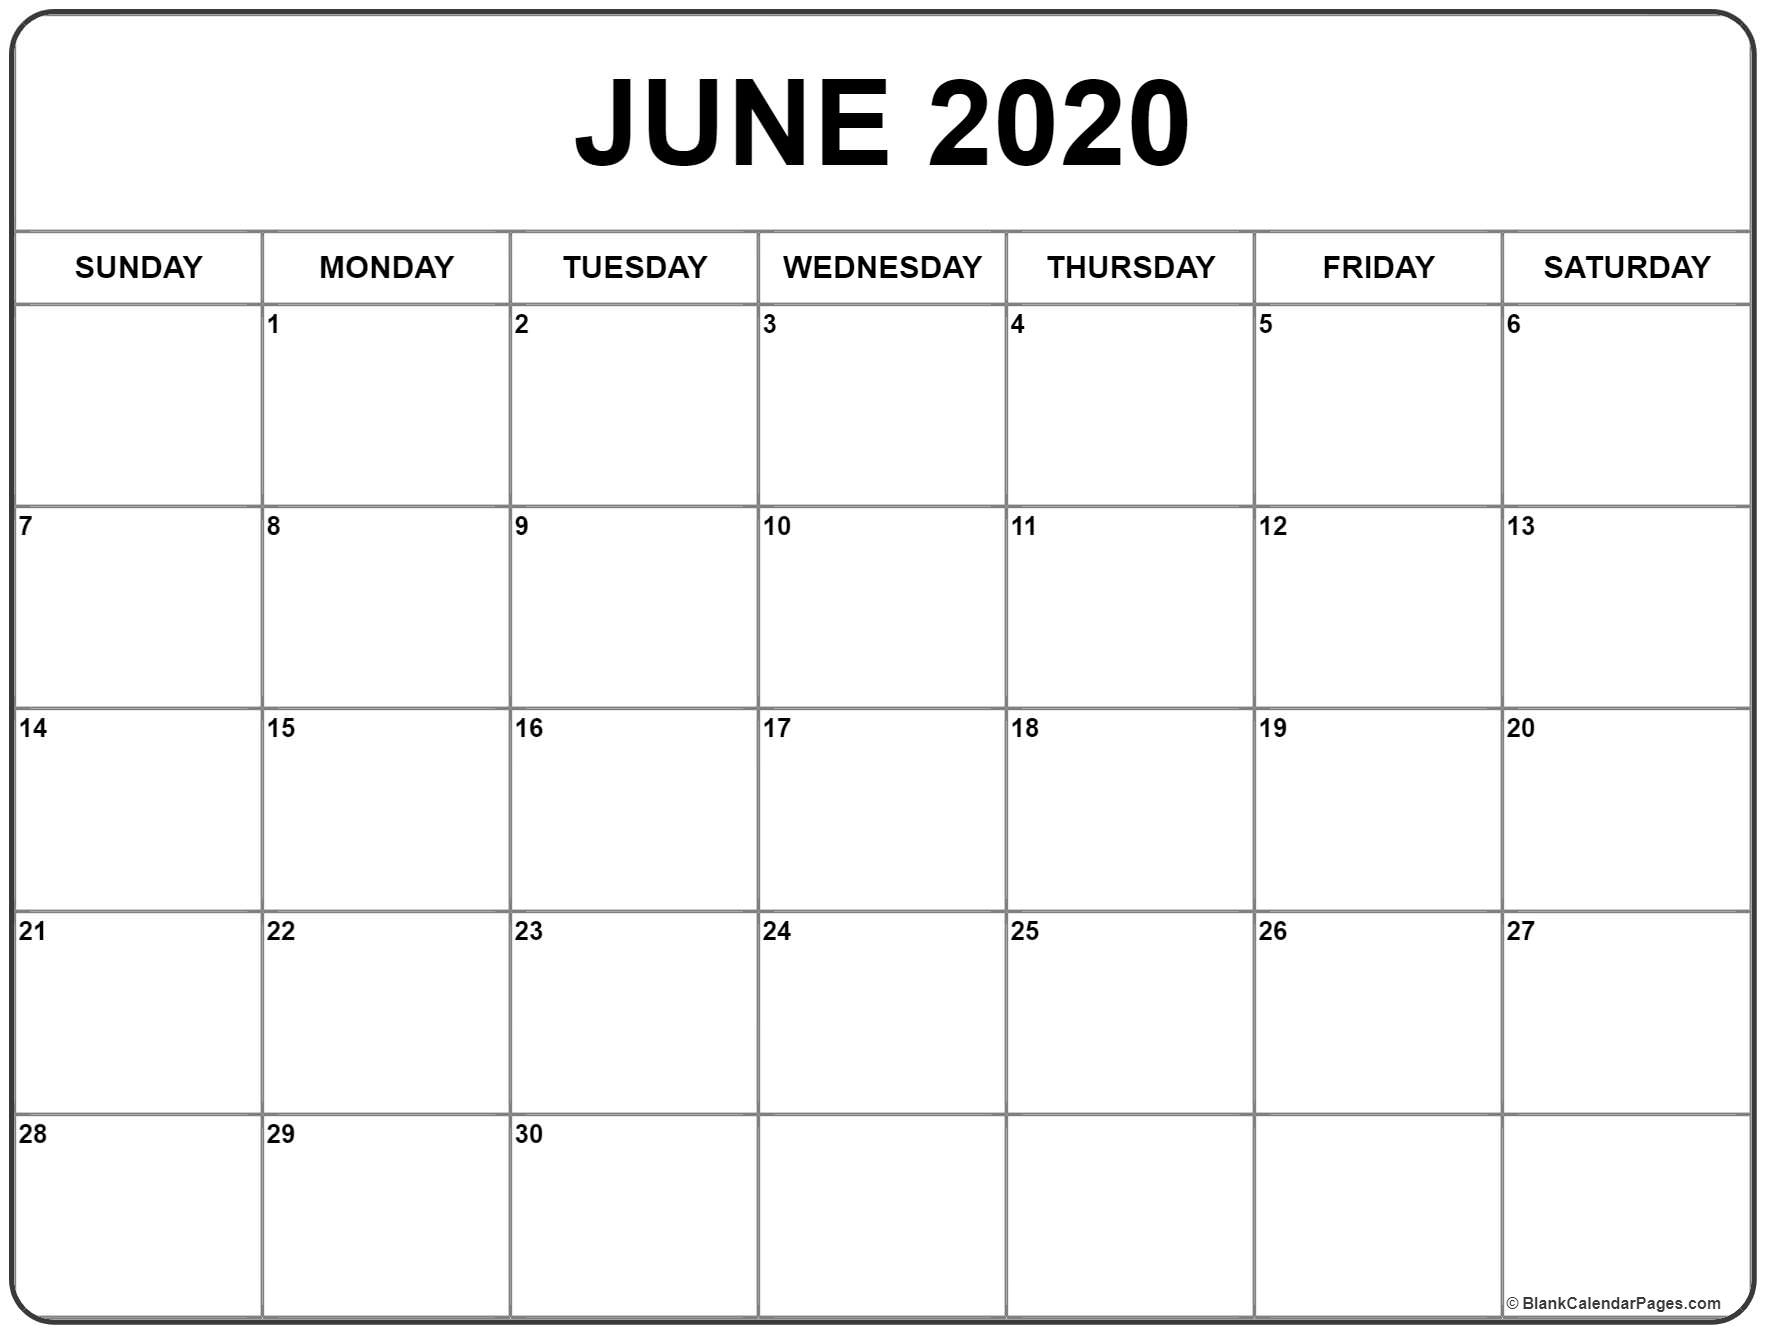 June 2020 Calendar | Free Printable Monthly Calendars_Blank Calendar Of June 2020